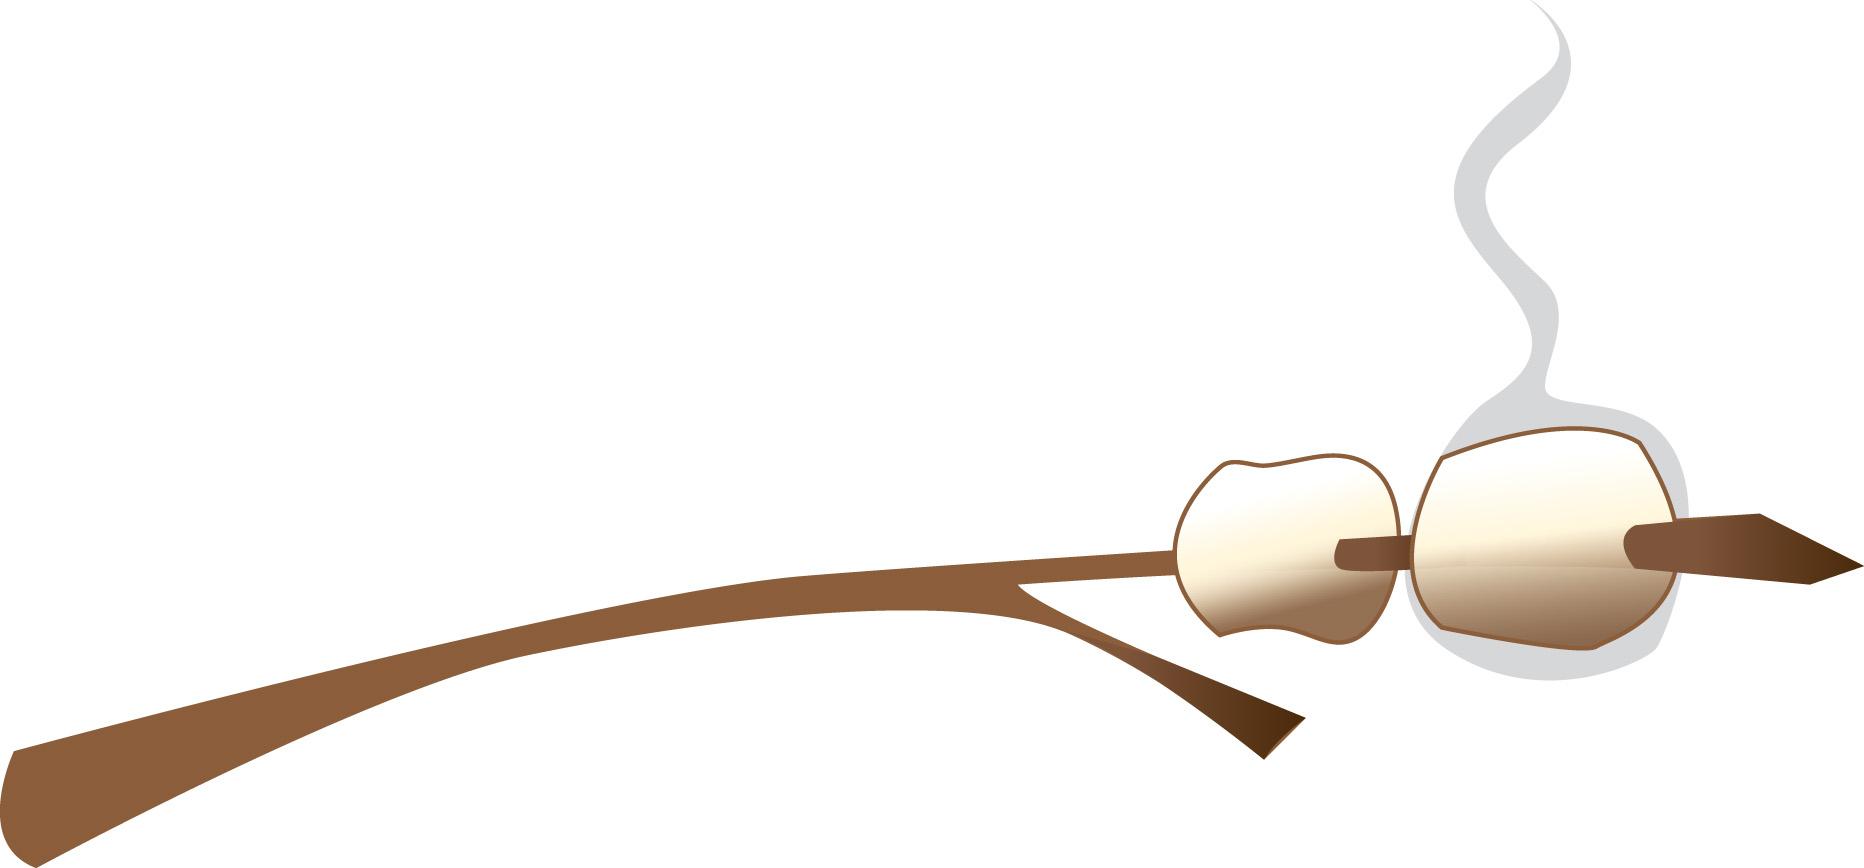 Cartoon Marshmallow Roasting Clipart Free Clip Art Images